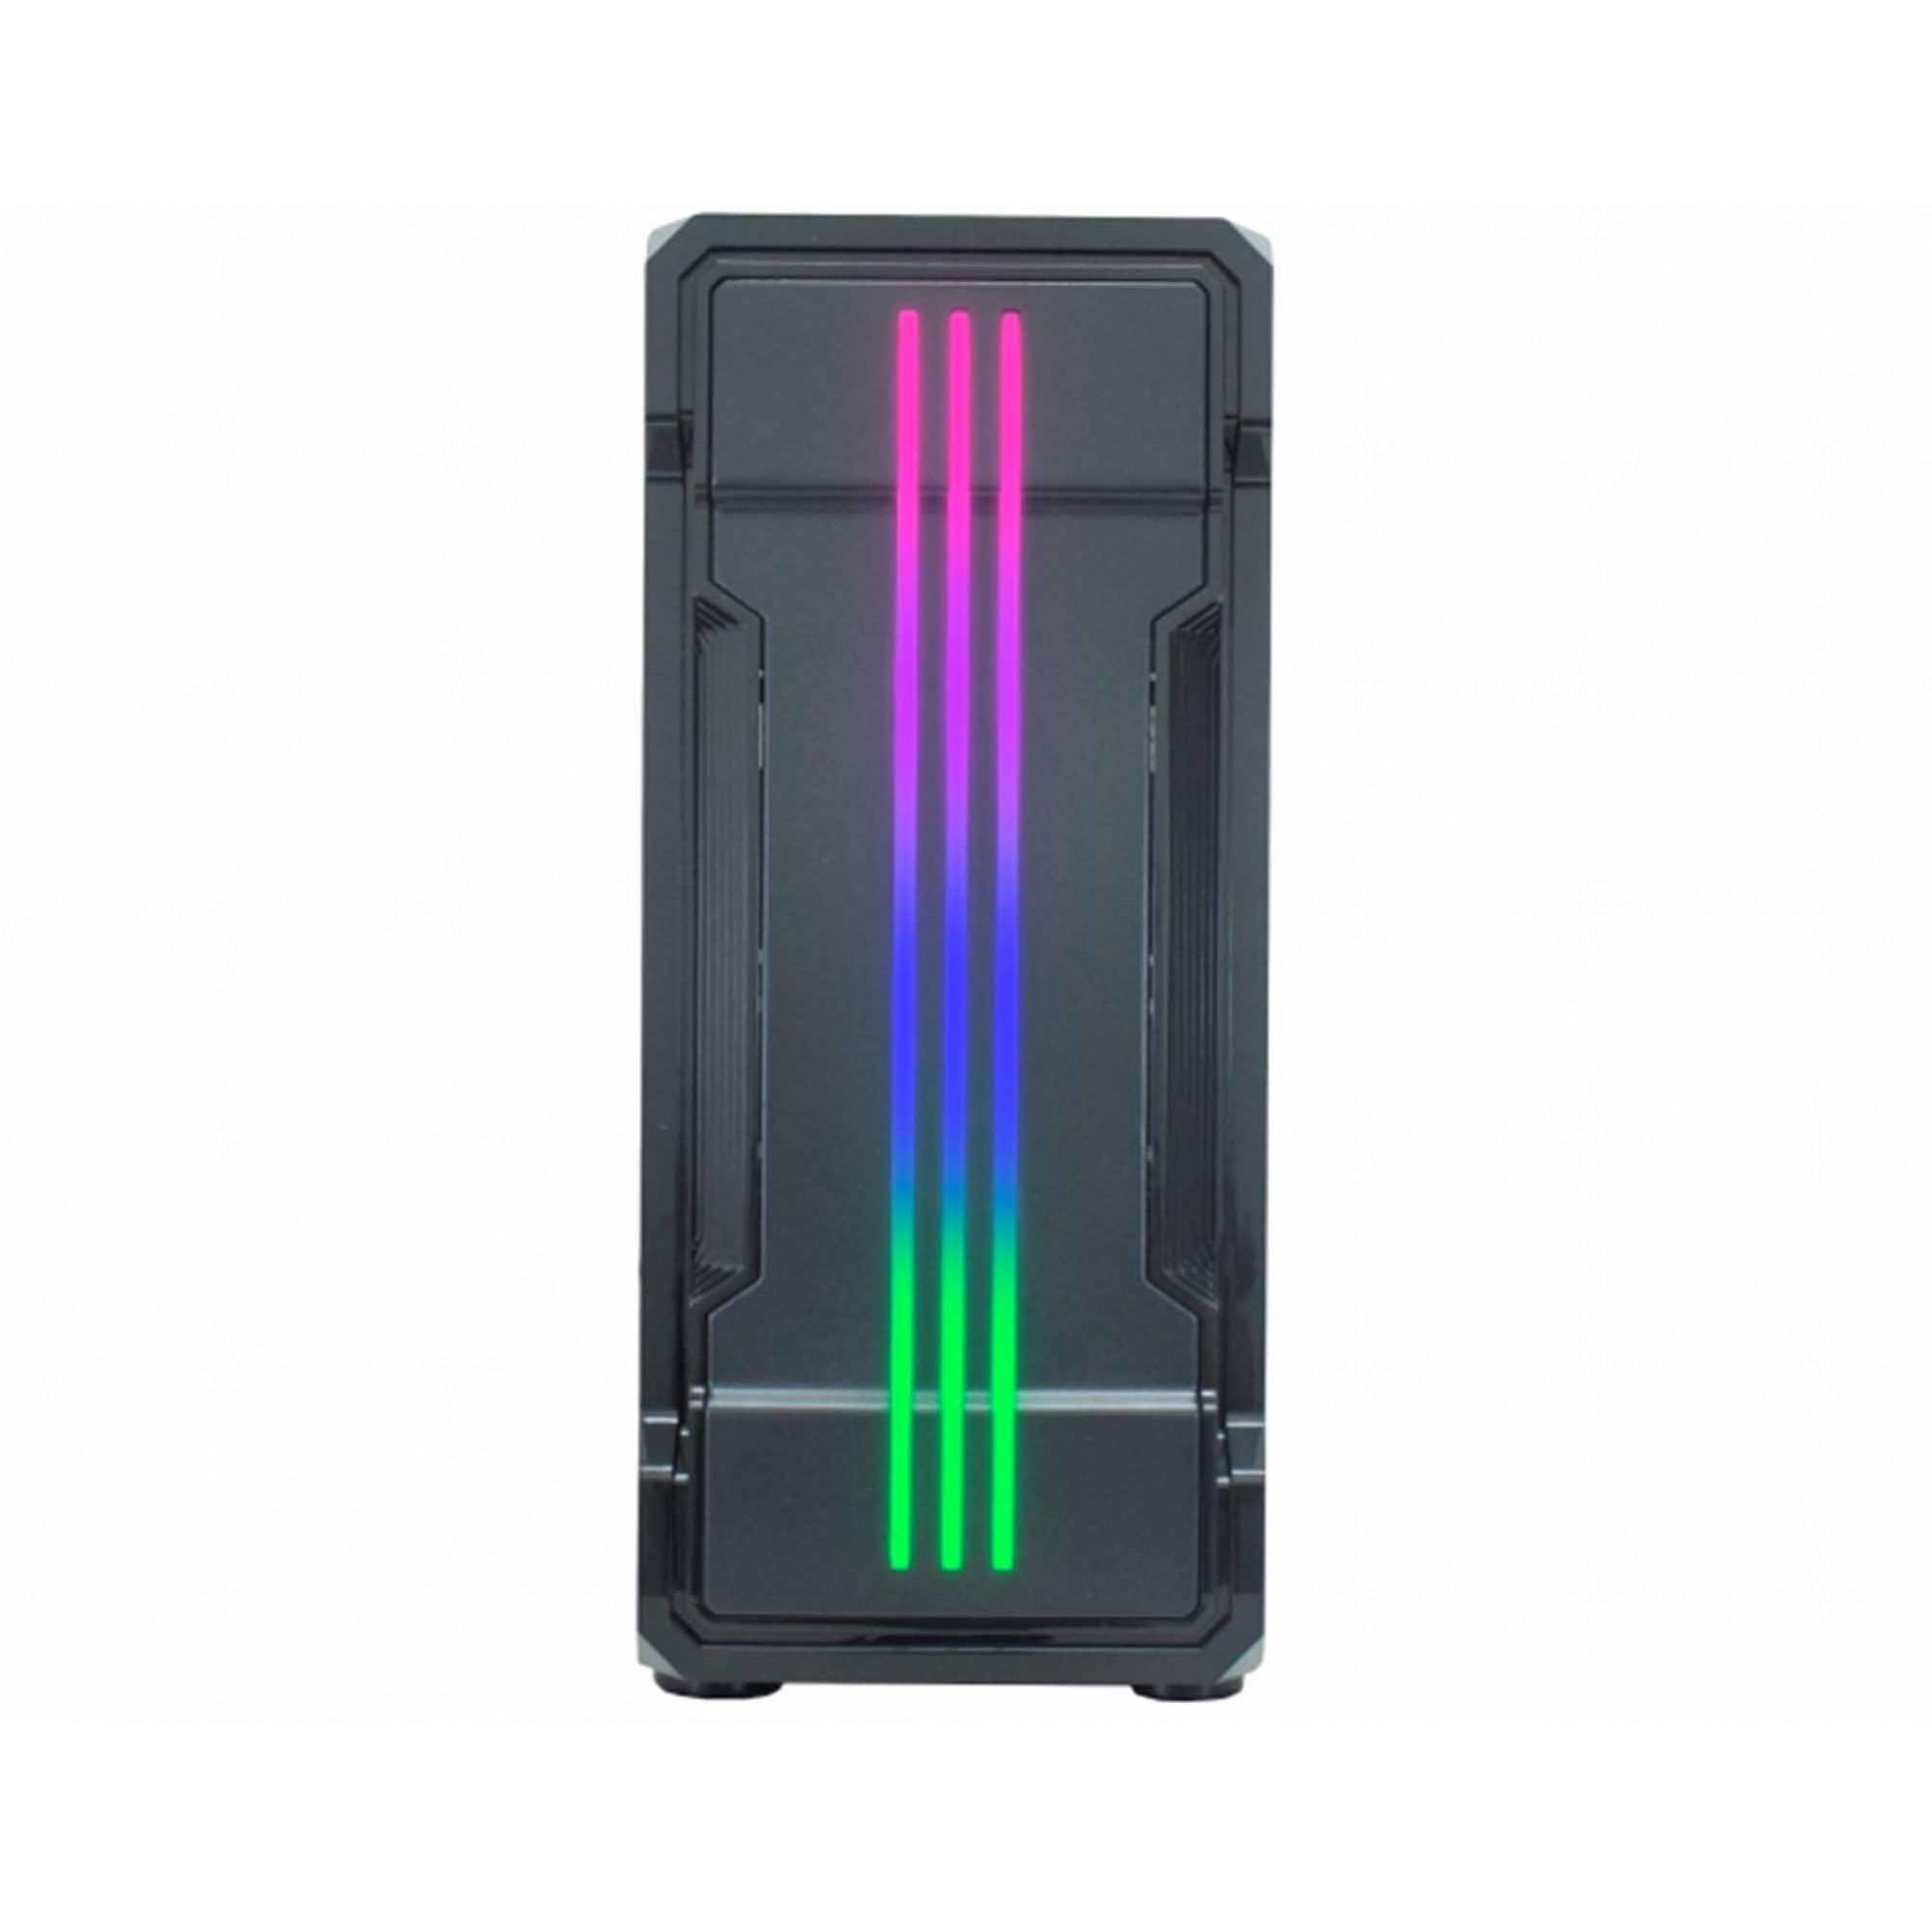 Gabinete Gamer K-Mex Bifrost II, Lateral em Vidro, Led RGB Frontal, Sem Fonte e Fan - CG-01KB